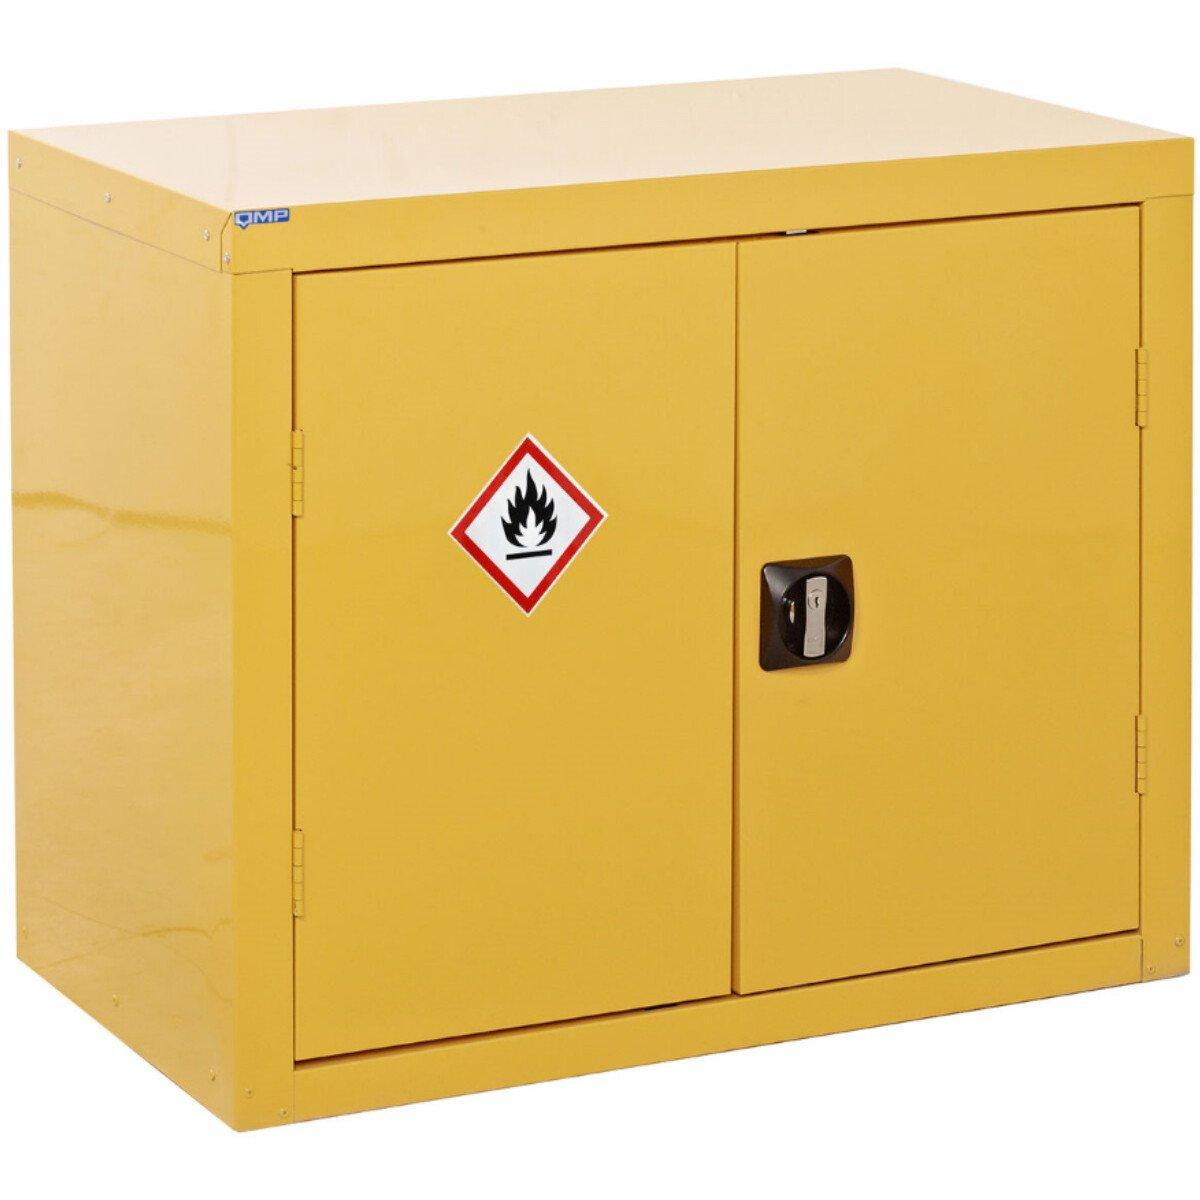 QMP CZ703530 Hazardous Substance Cupboard 700 x 350 x 300mm